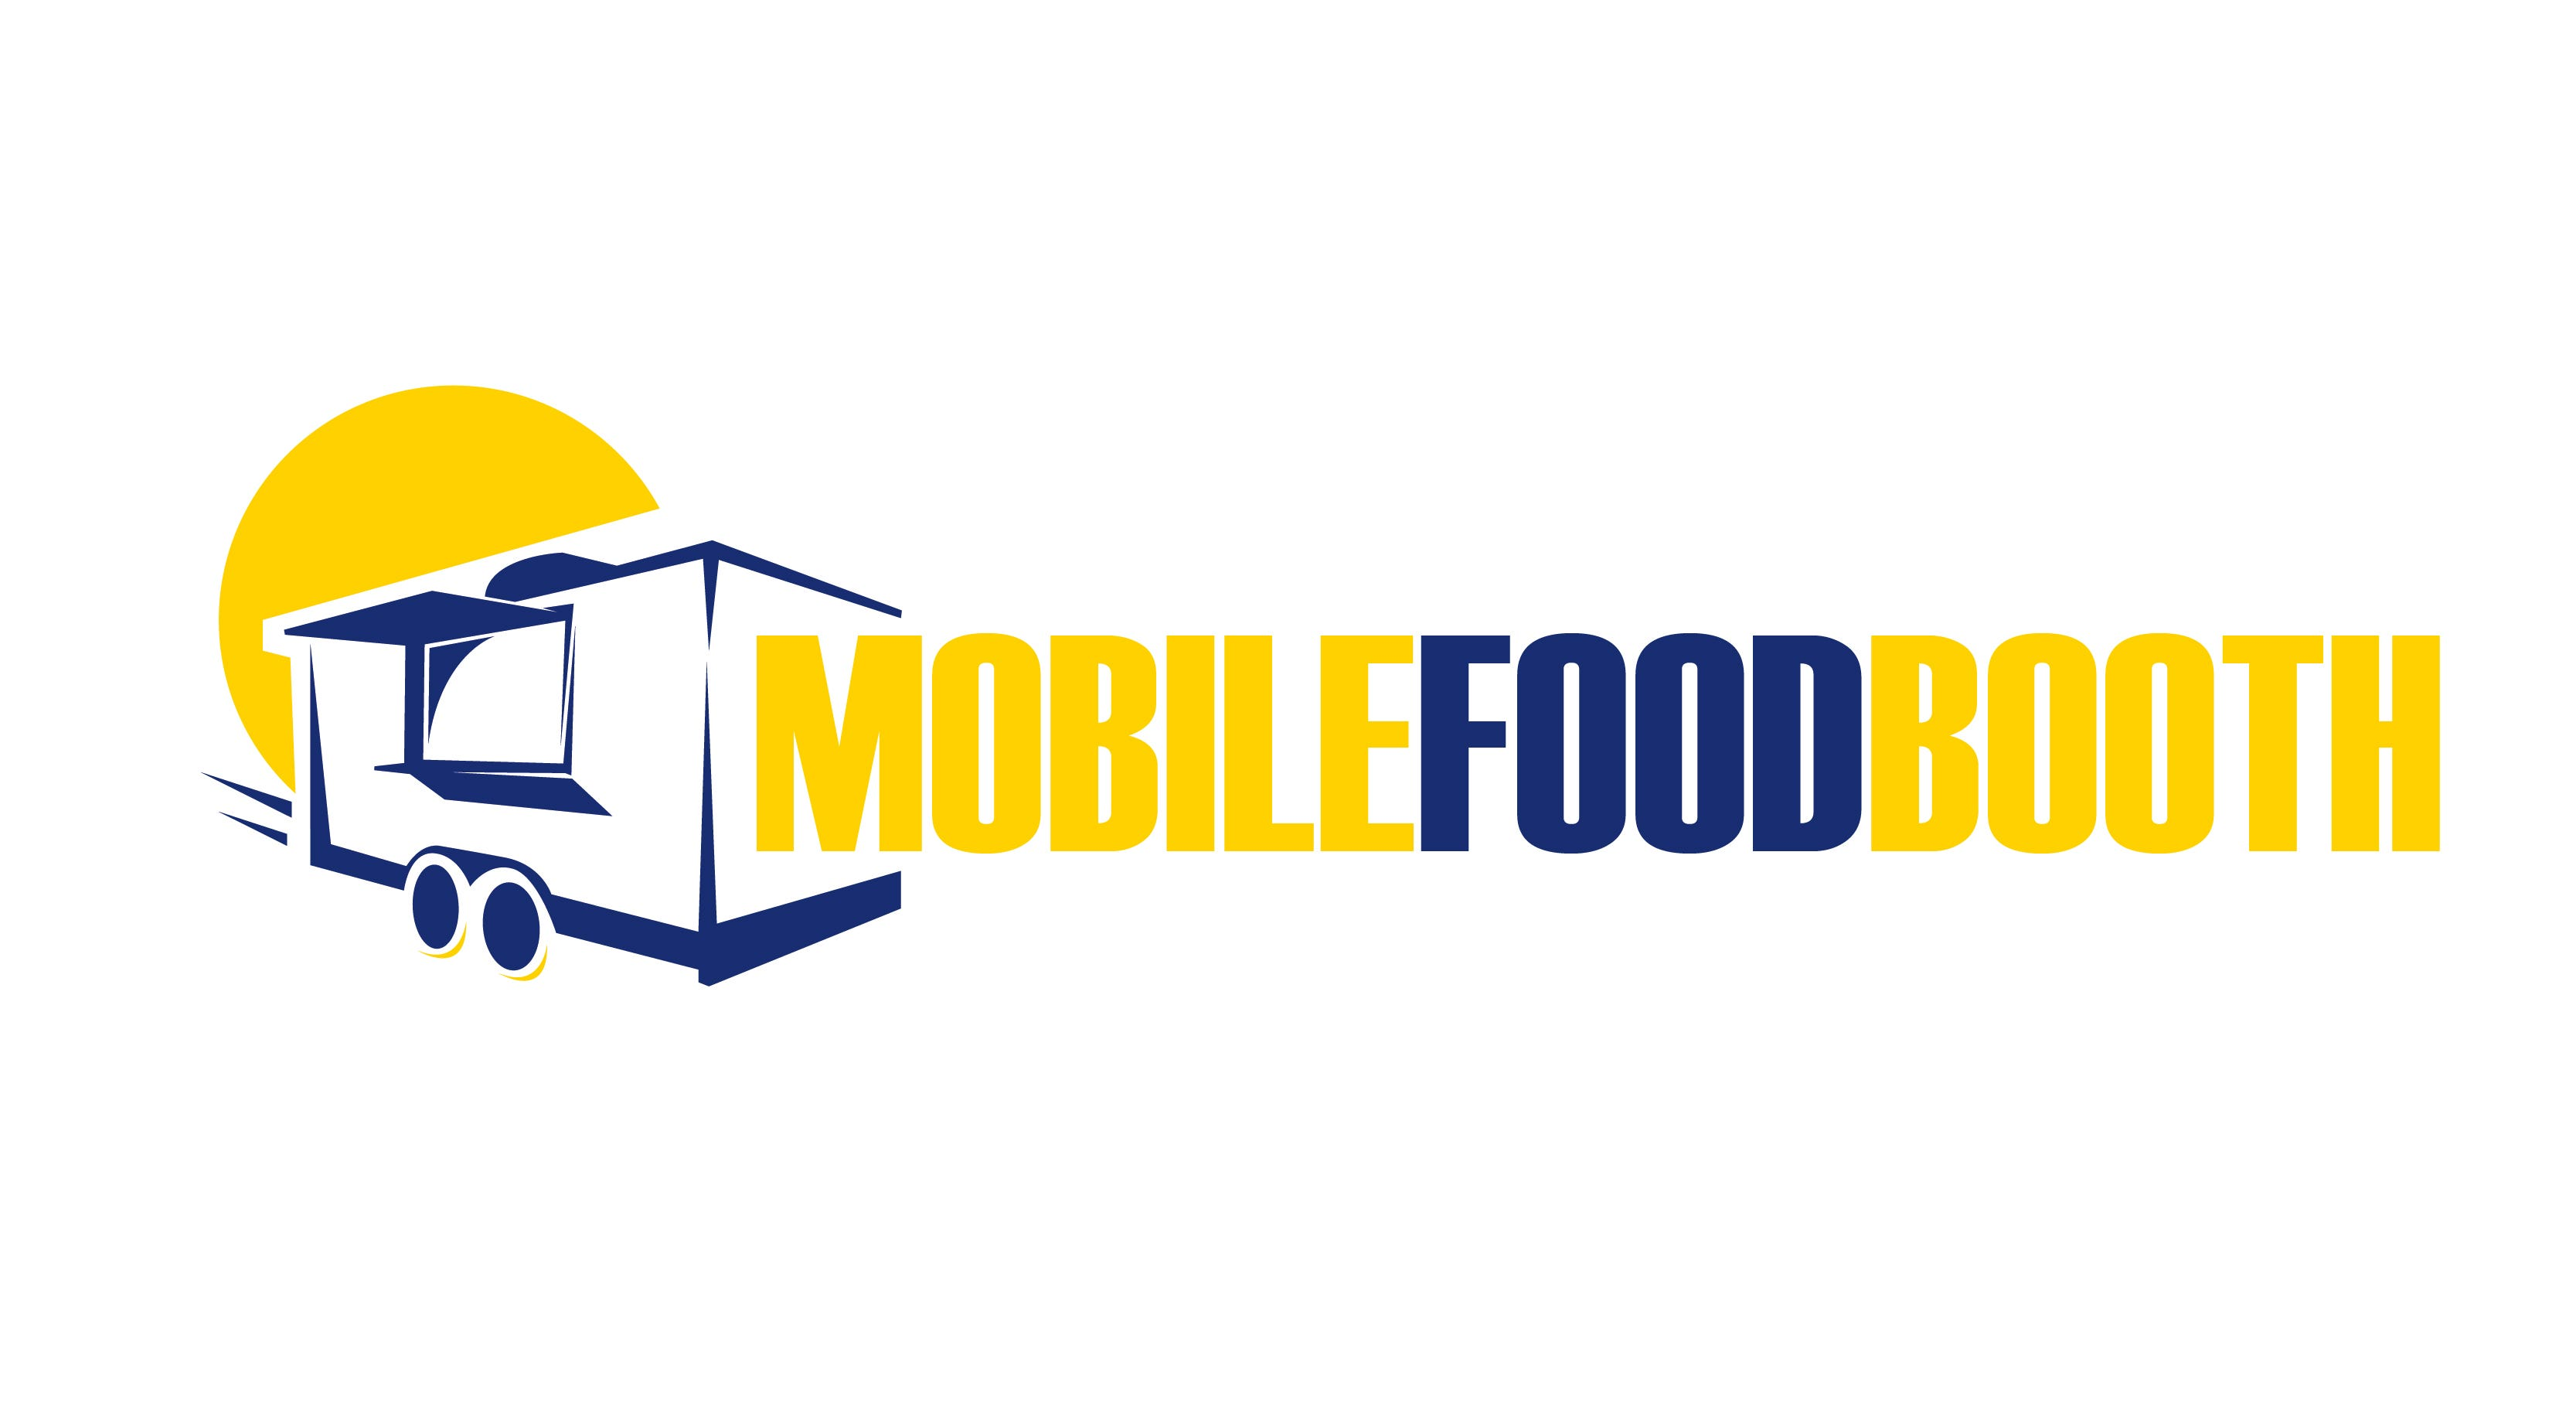 Mobilefoodbooth University